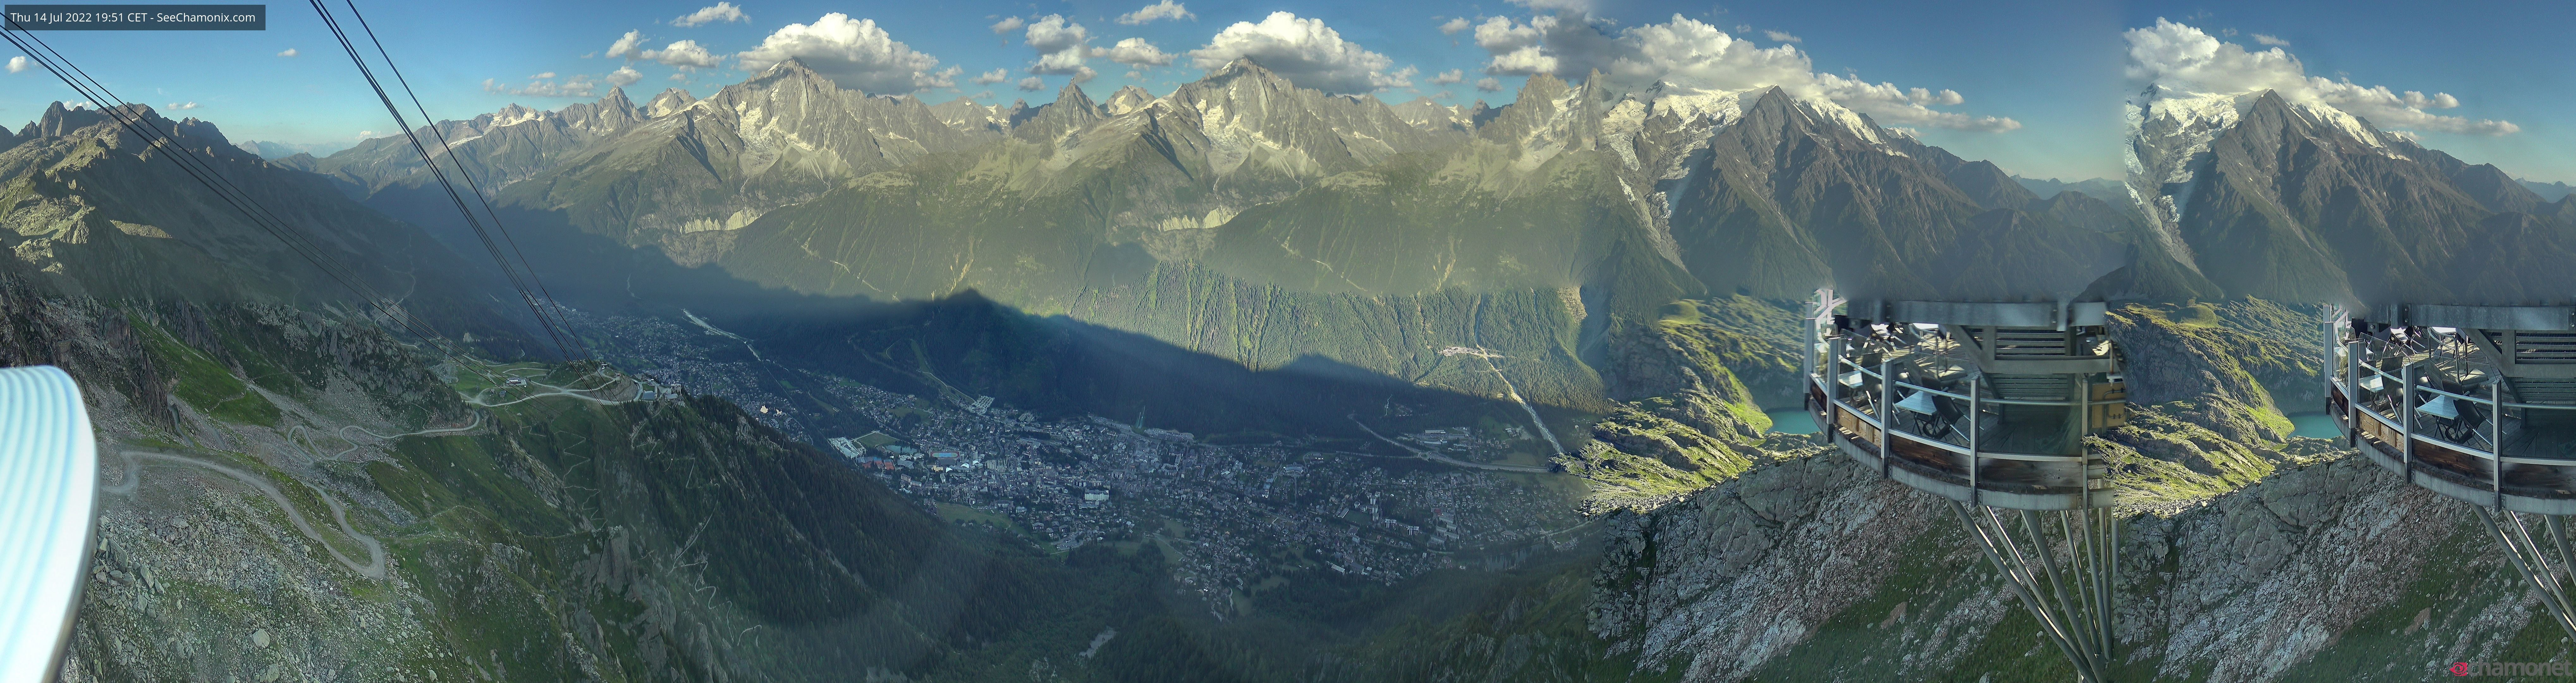 Chamonix Mont-Blanc webcam panorama